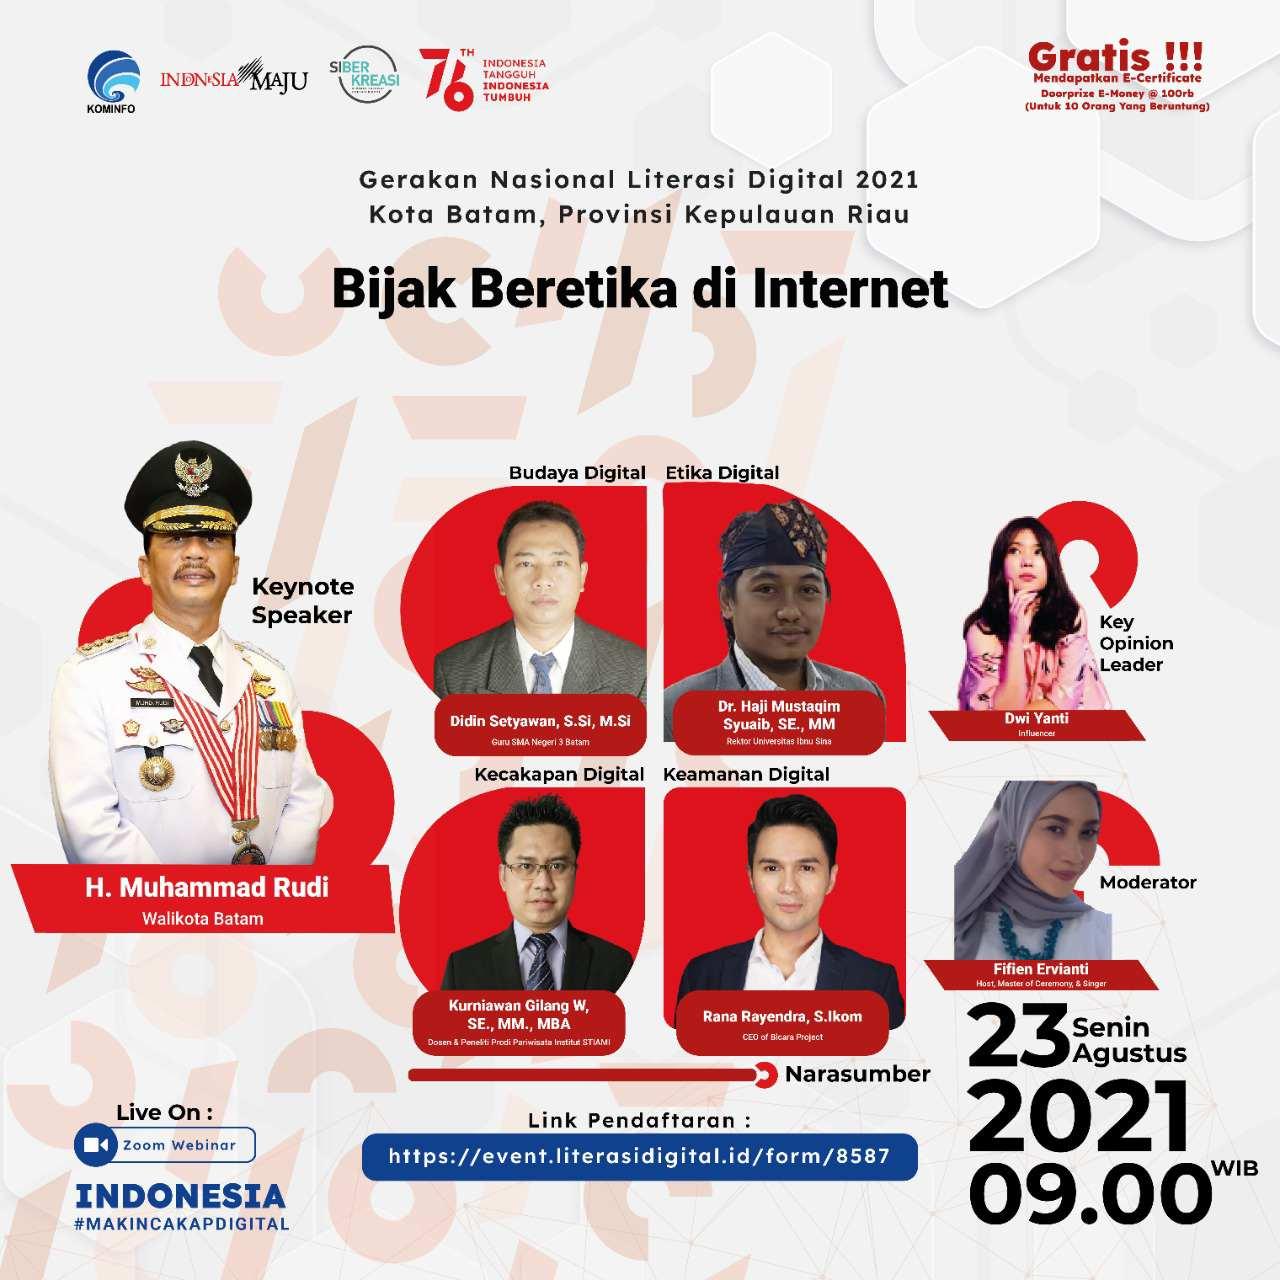 Kemkominfo melalui Direktorat Jenderal Aplikasi Informatika menyelenggarakan kegiatan Webinar Indonesia Makin Cakap Digital di Wilayah Sumatera di 77 Kab/Kota dari Aceh hingga Lampung